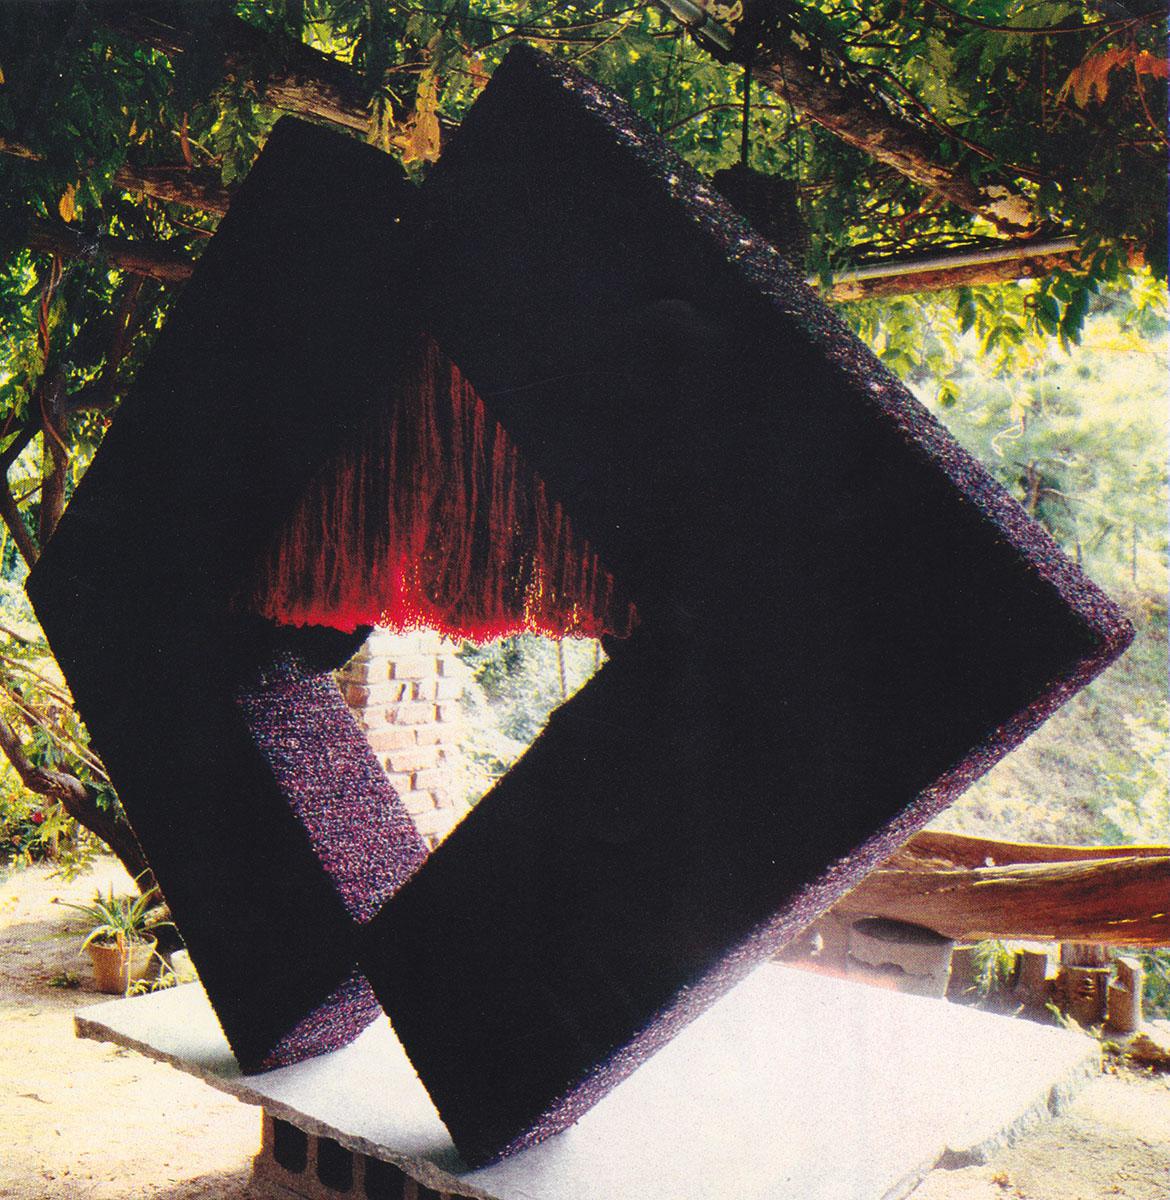 SANGLAN KIM – PORTRAIT D'ARTISTE